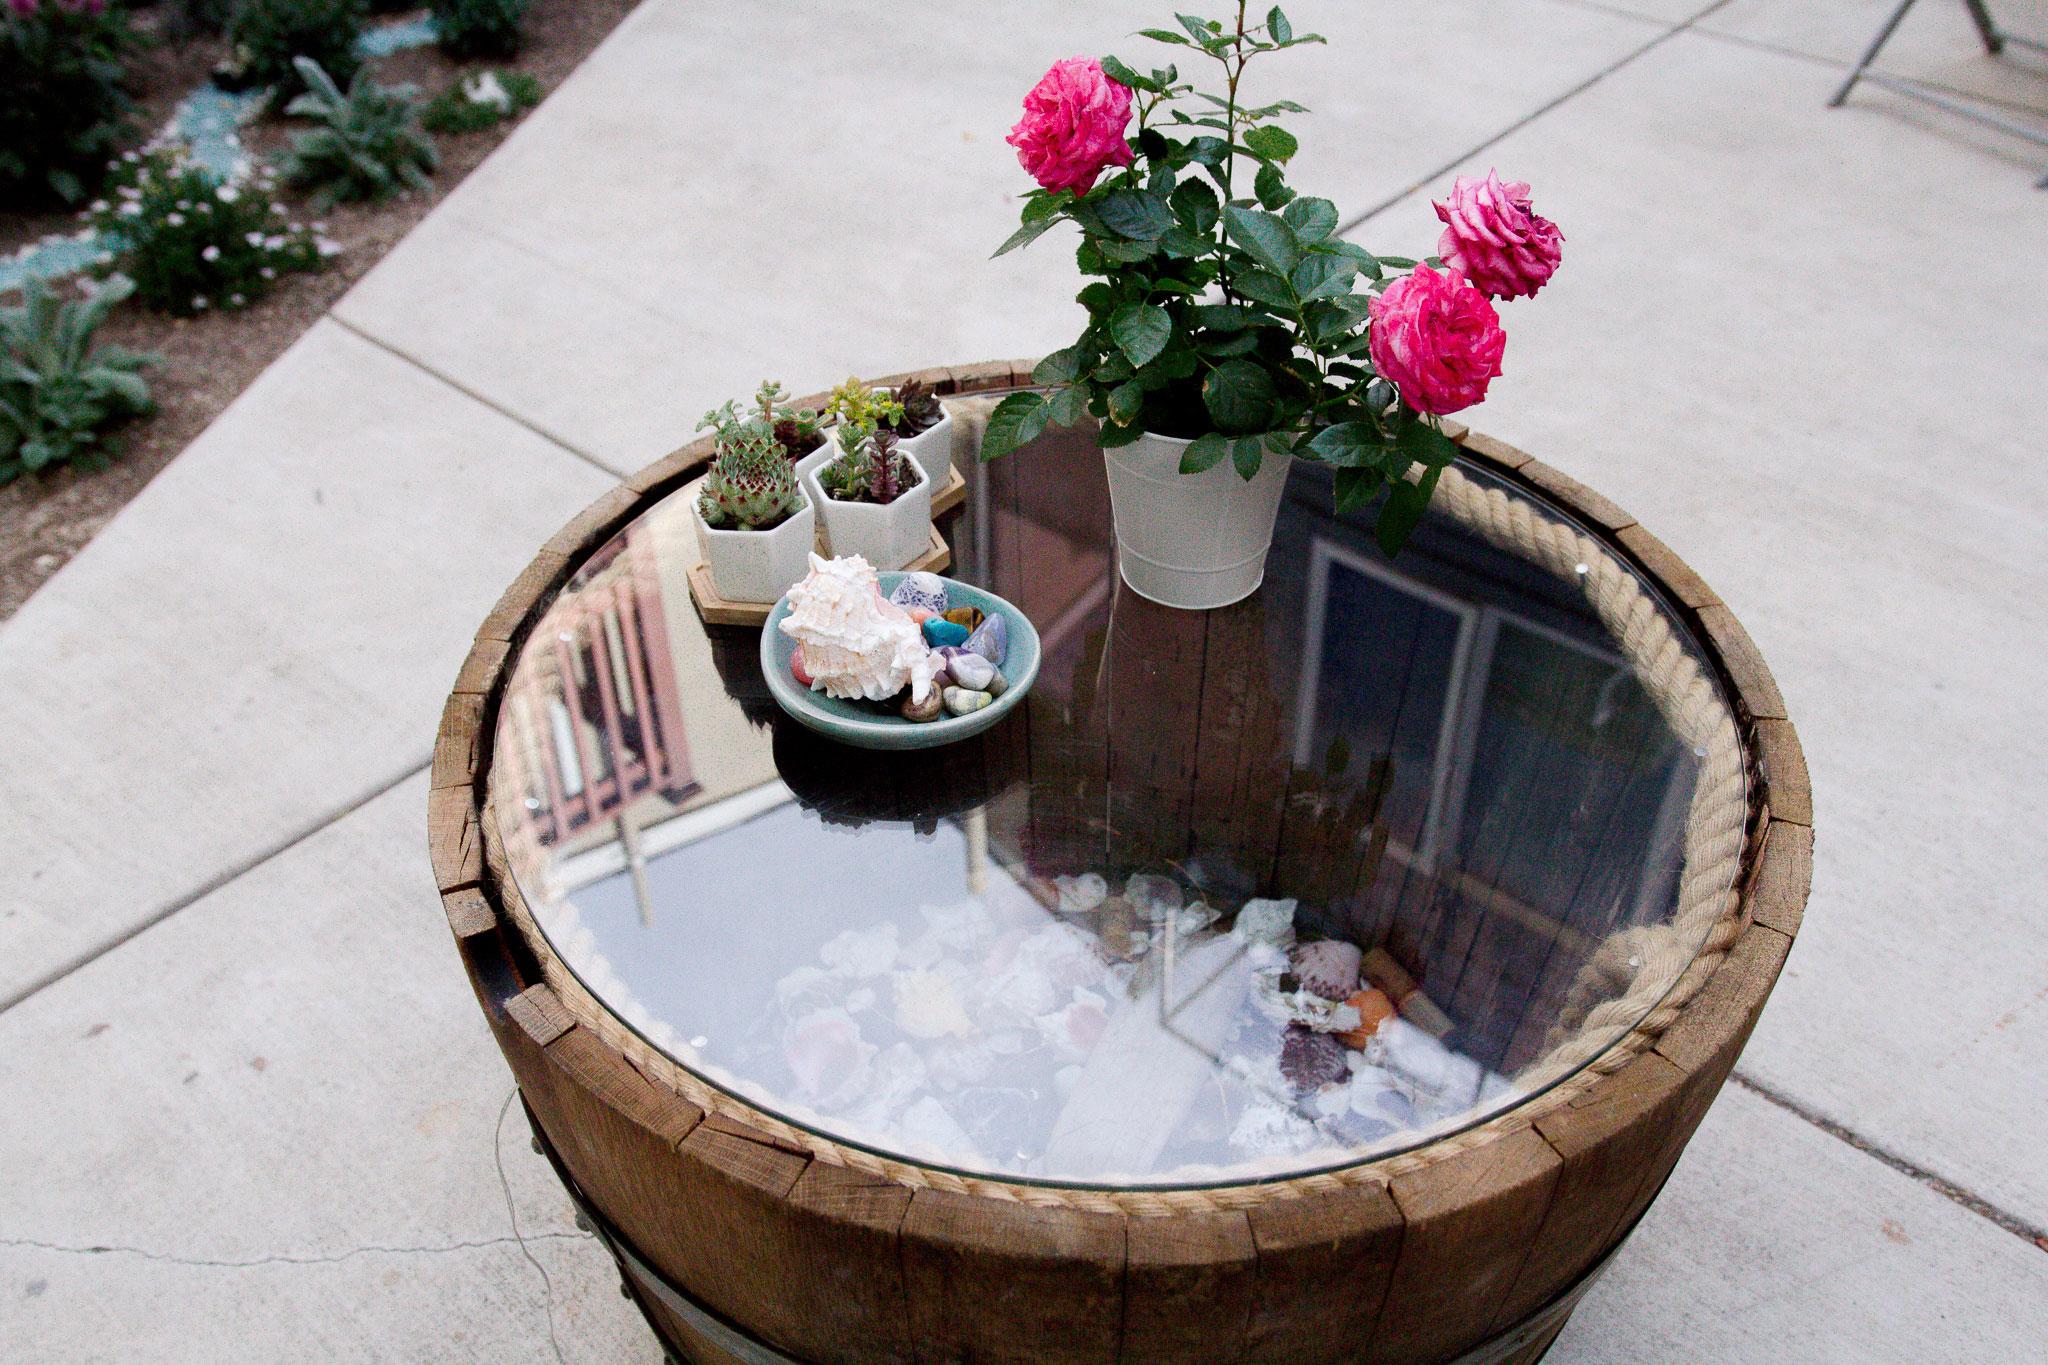 Adelya_Tumasyeva_the-garden-project_24.jpg